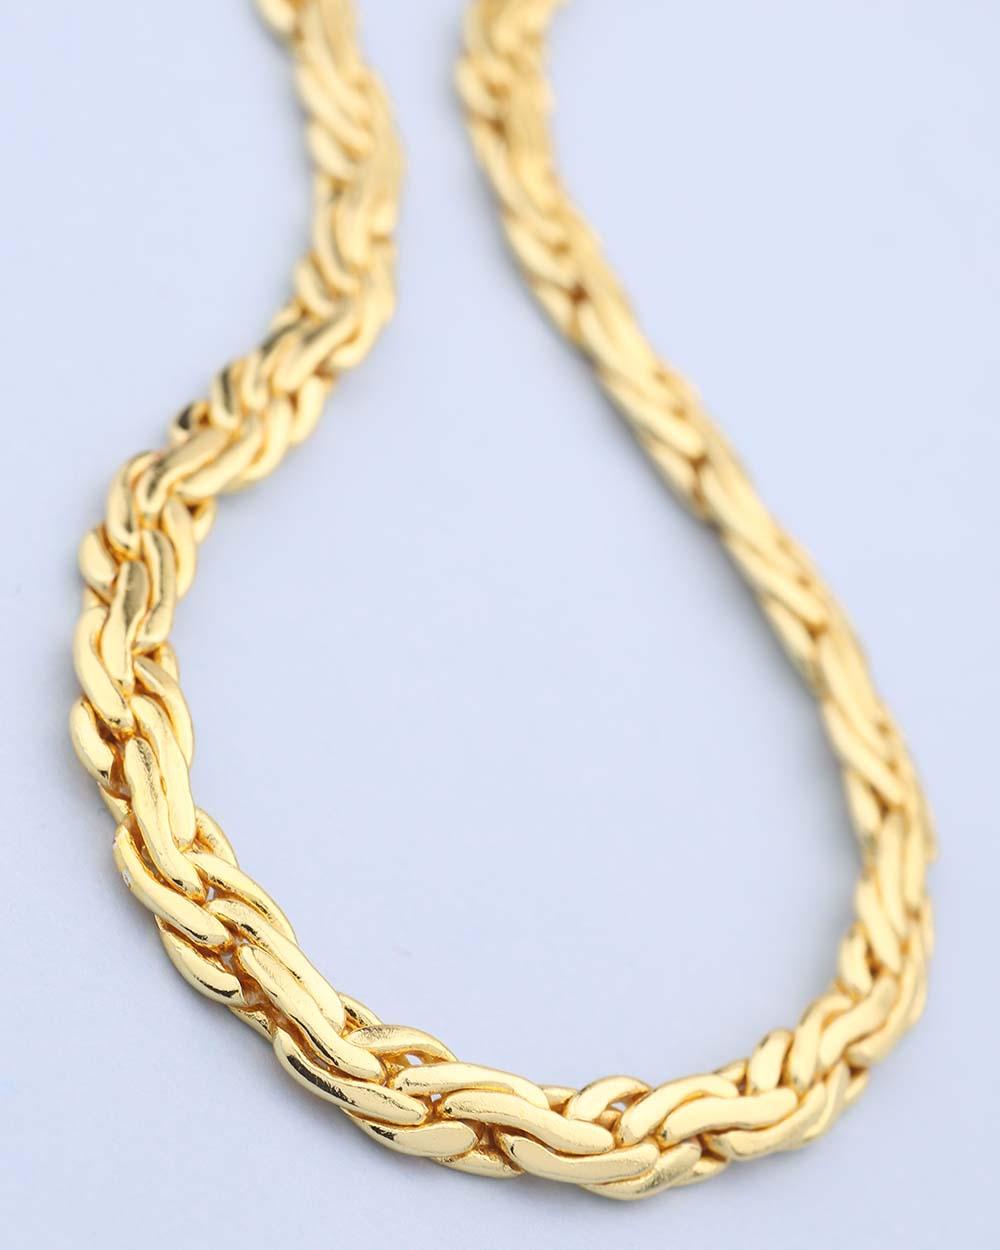 Buy Classy Yellow Gold Chain For Men Online India | Voylla